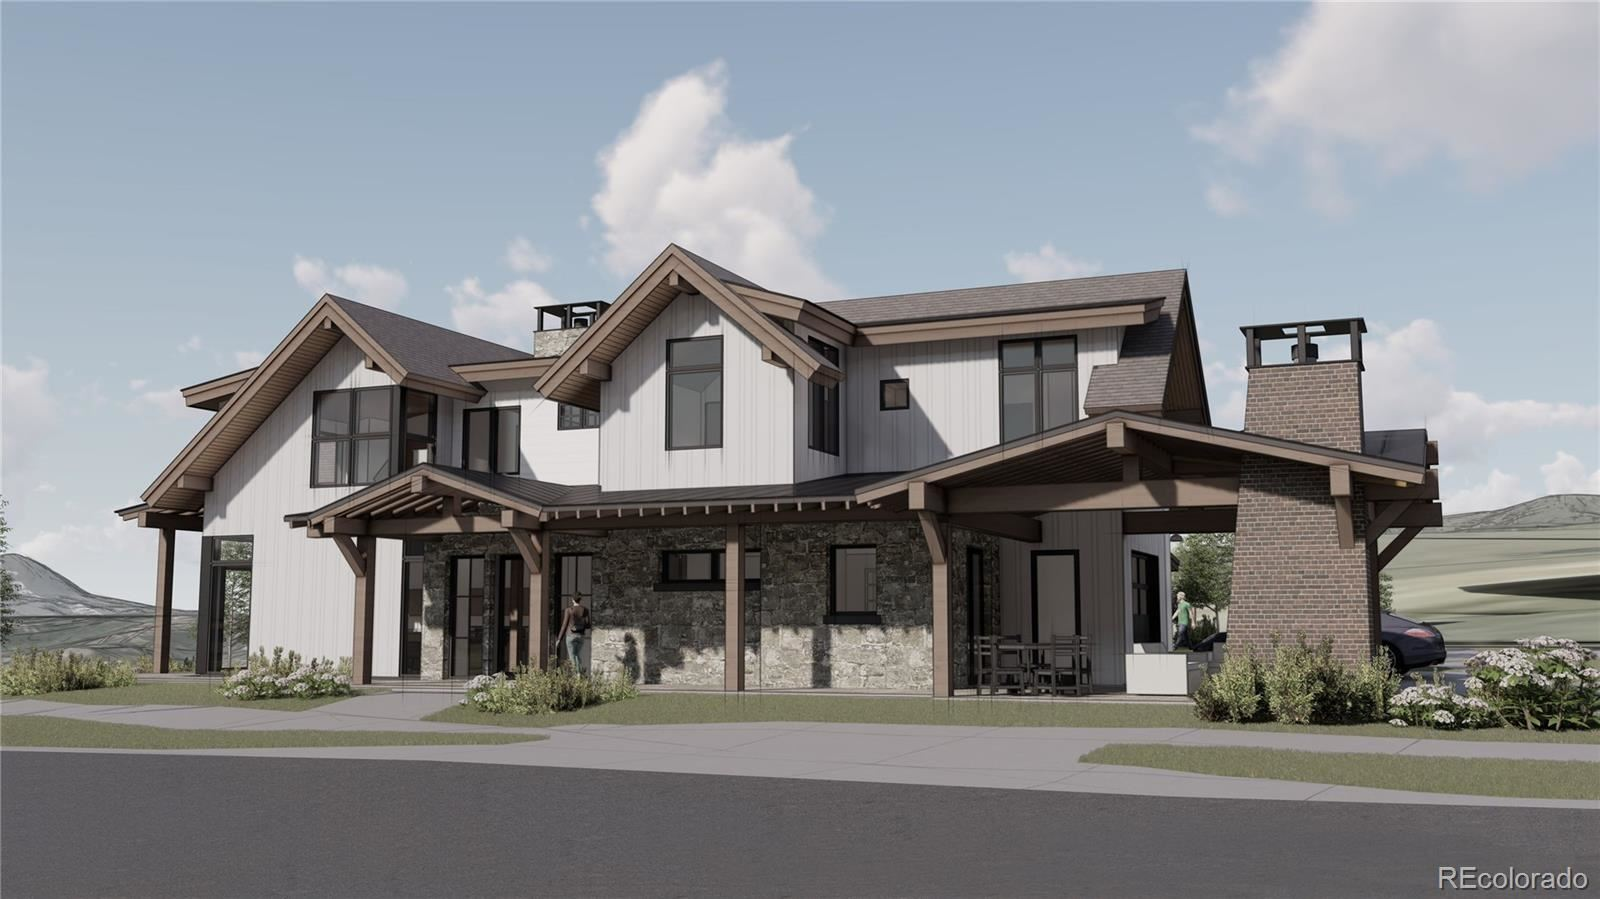 1851 Sunlight Drive, Steamboat Springs, CO 80487 - MLS#: 3270443